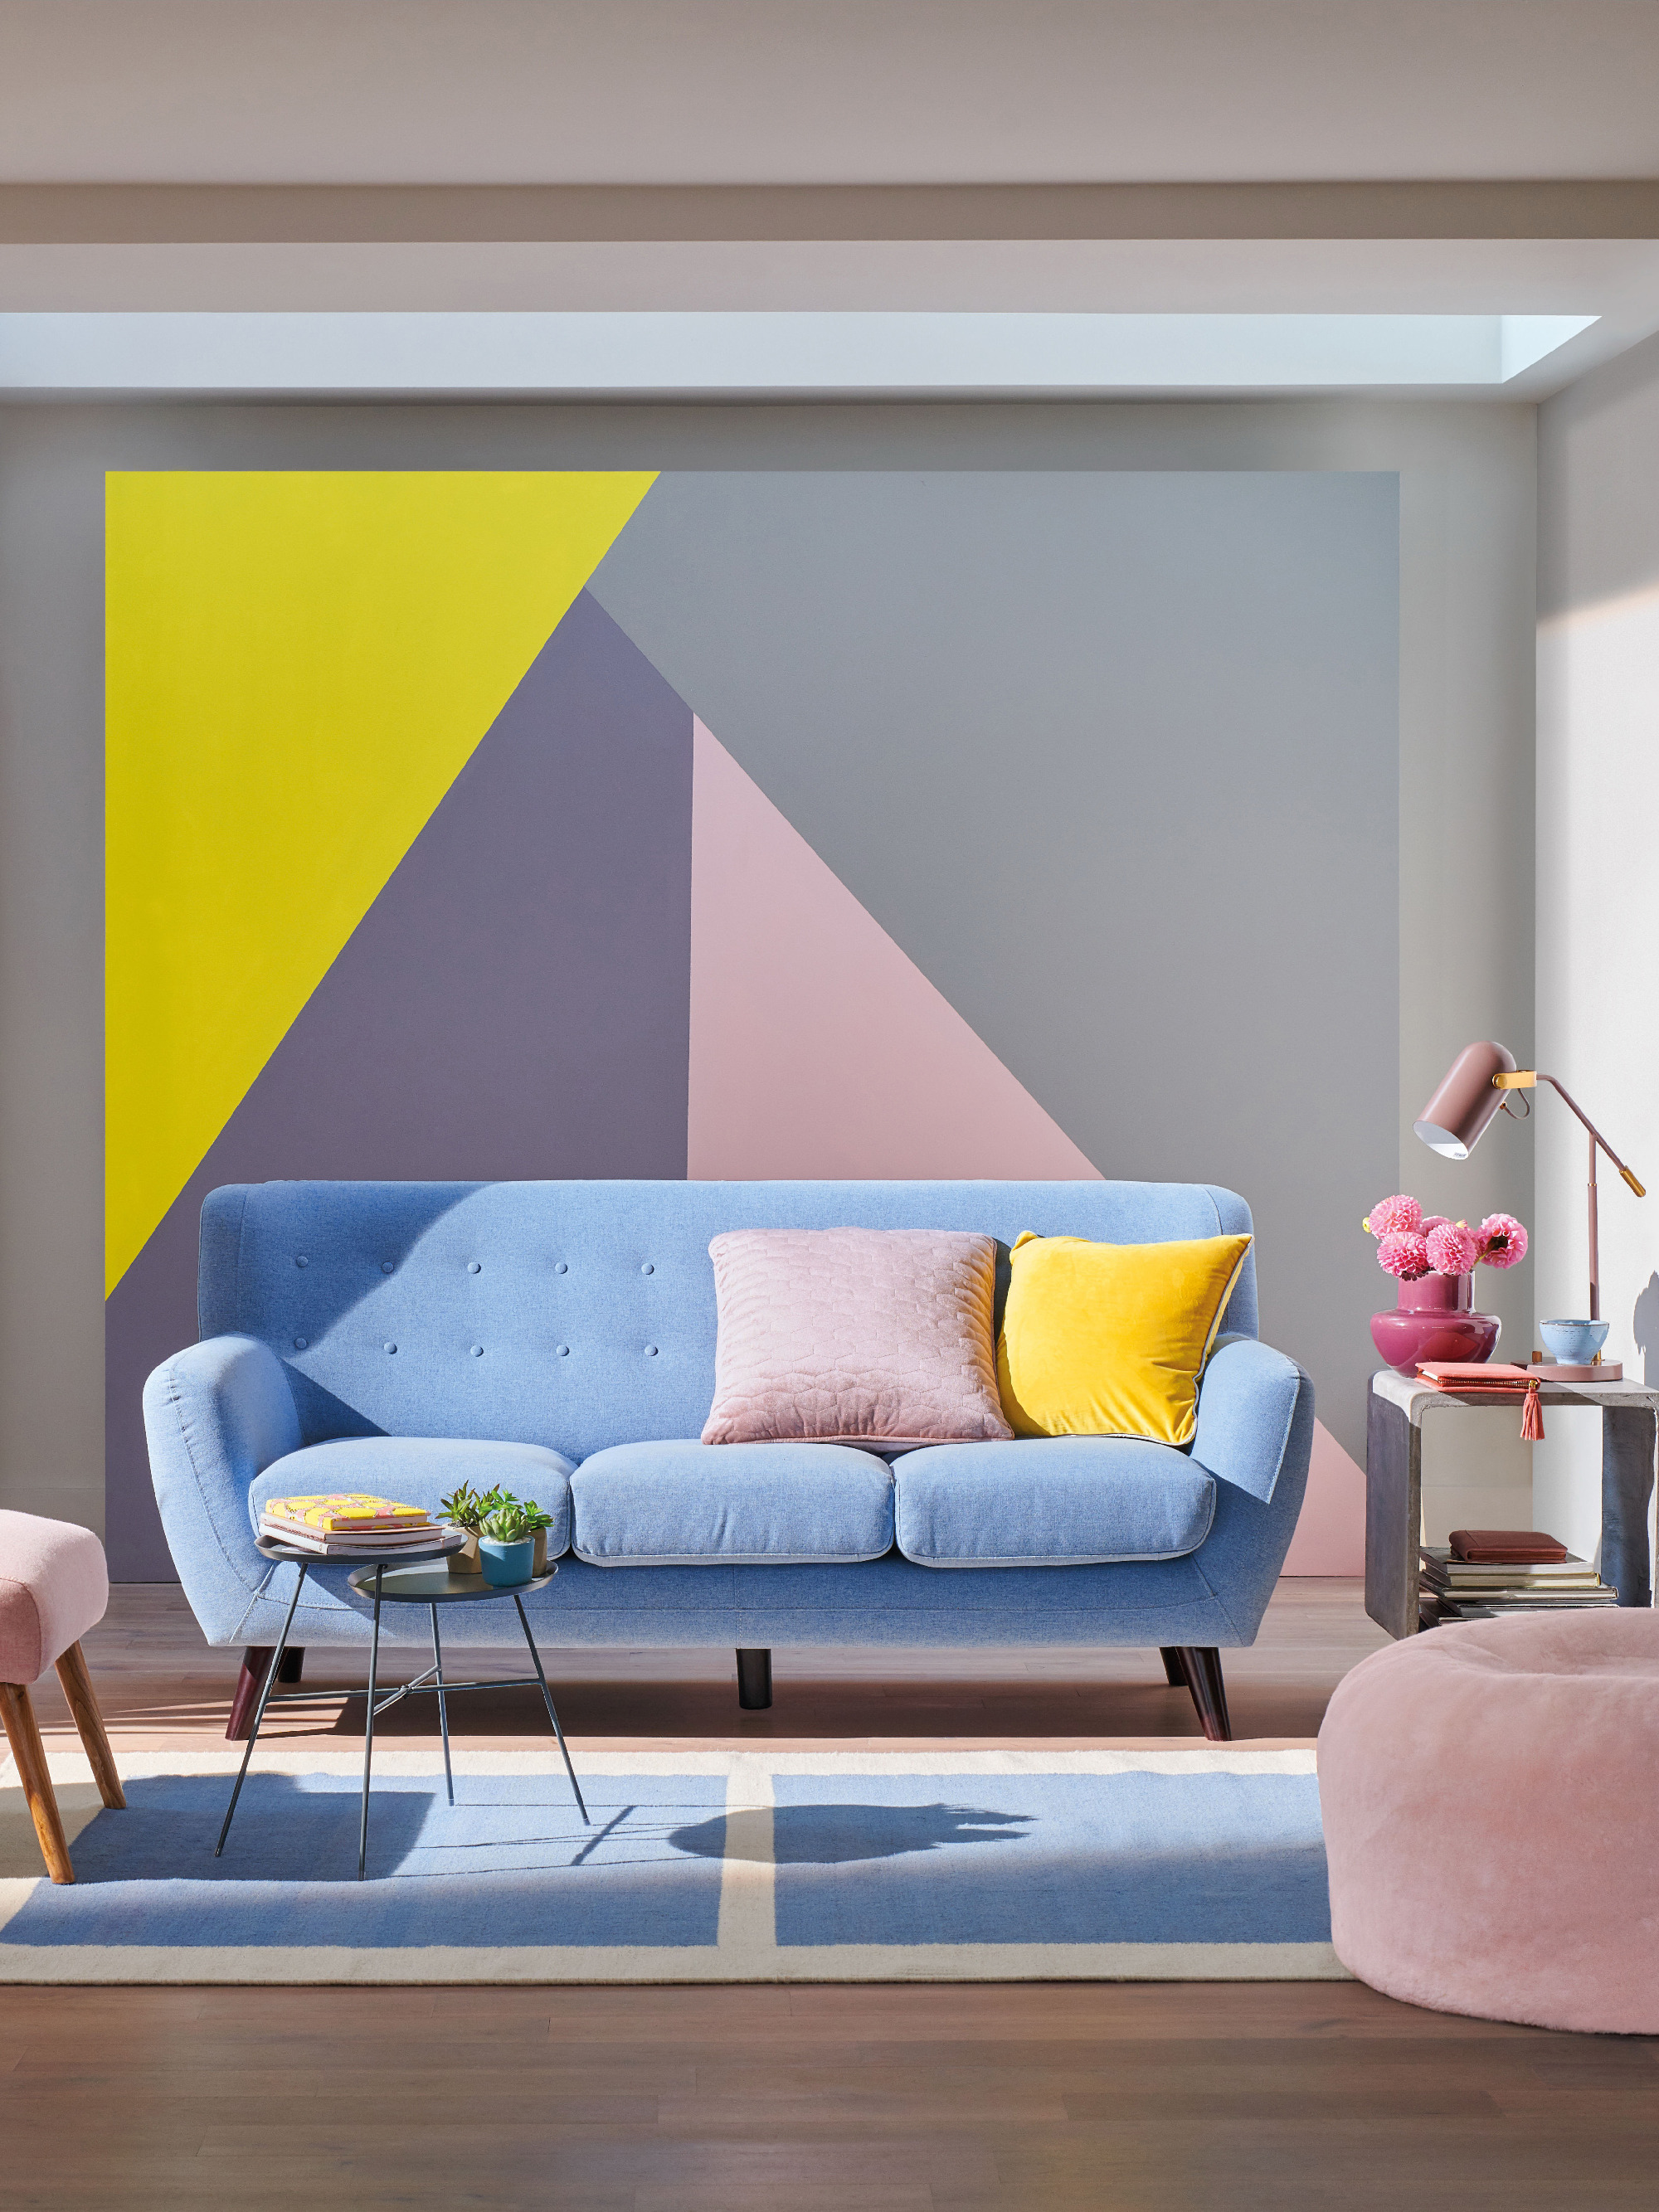 《Homesense》2019春夏家居生活系列Lookbook